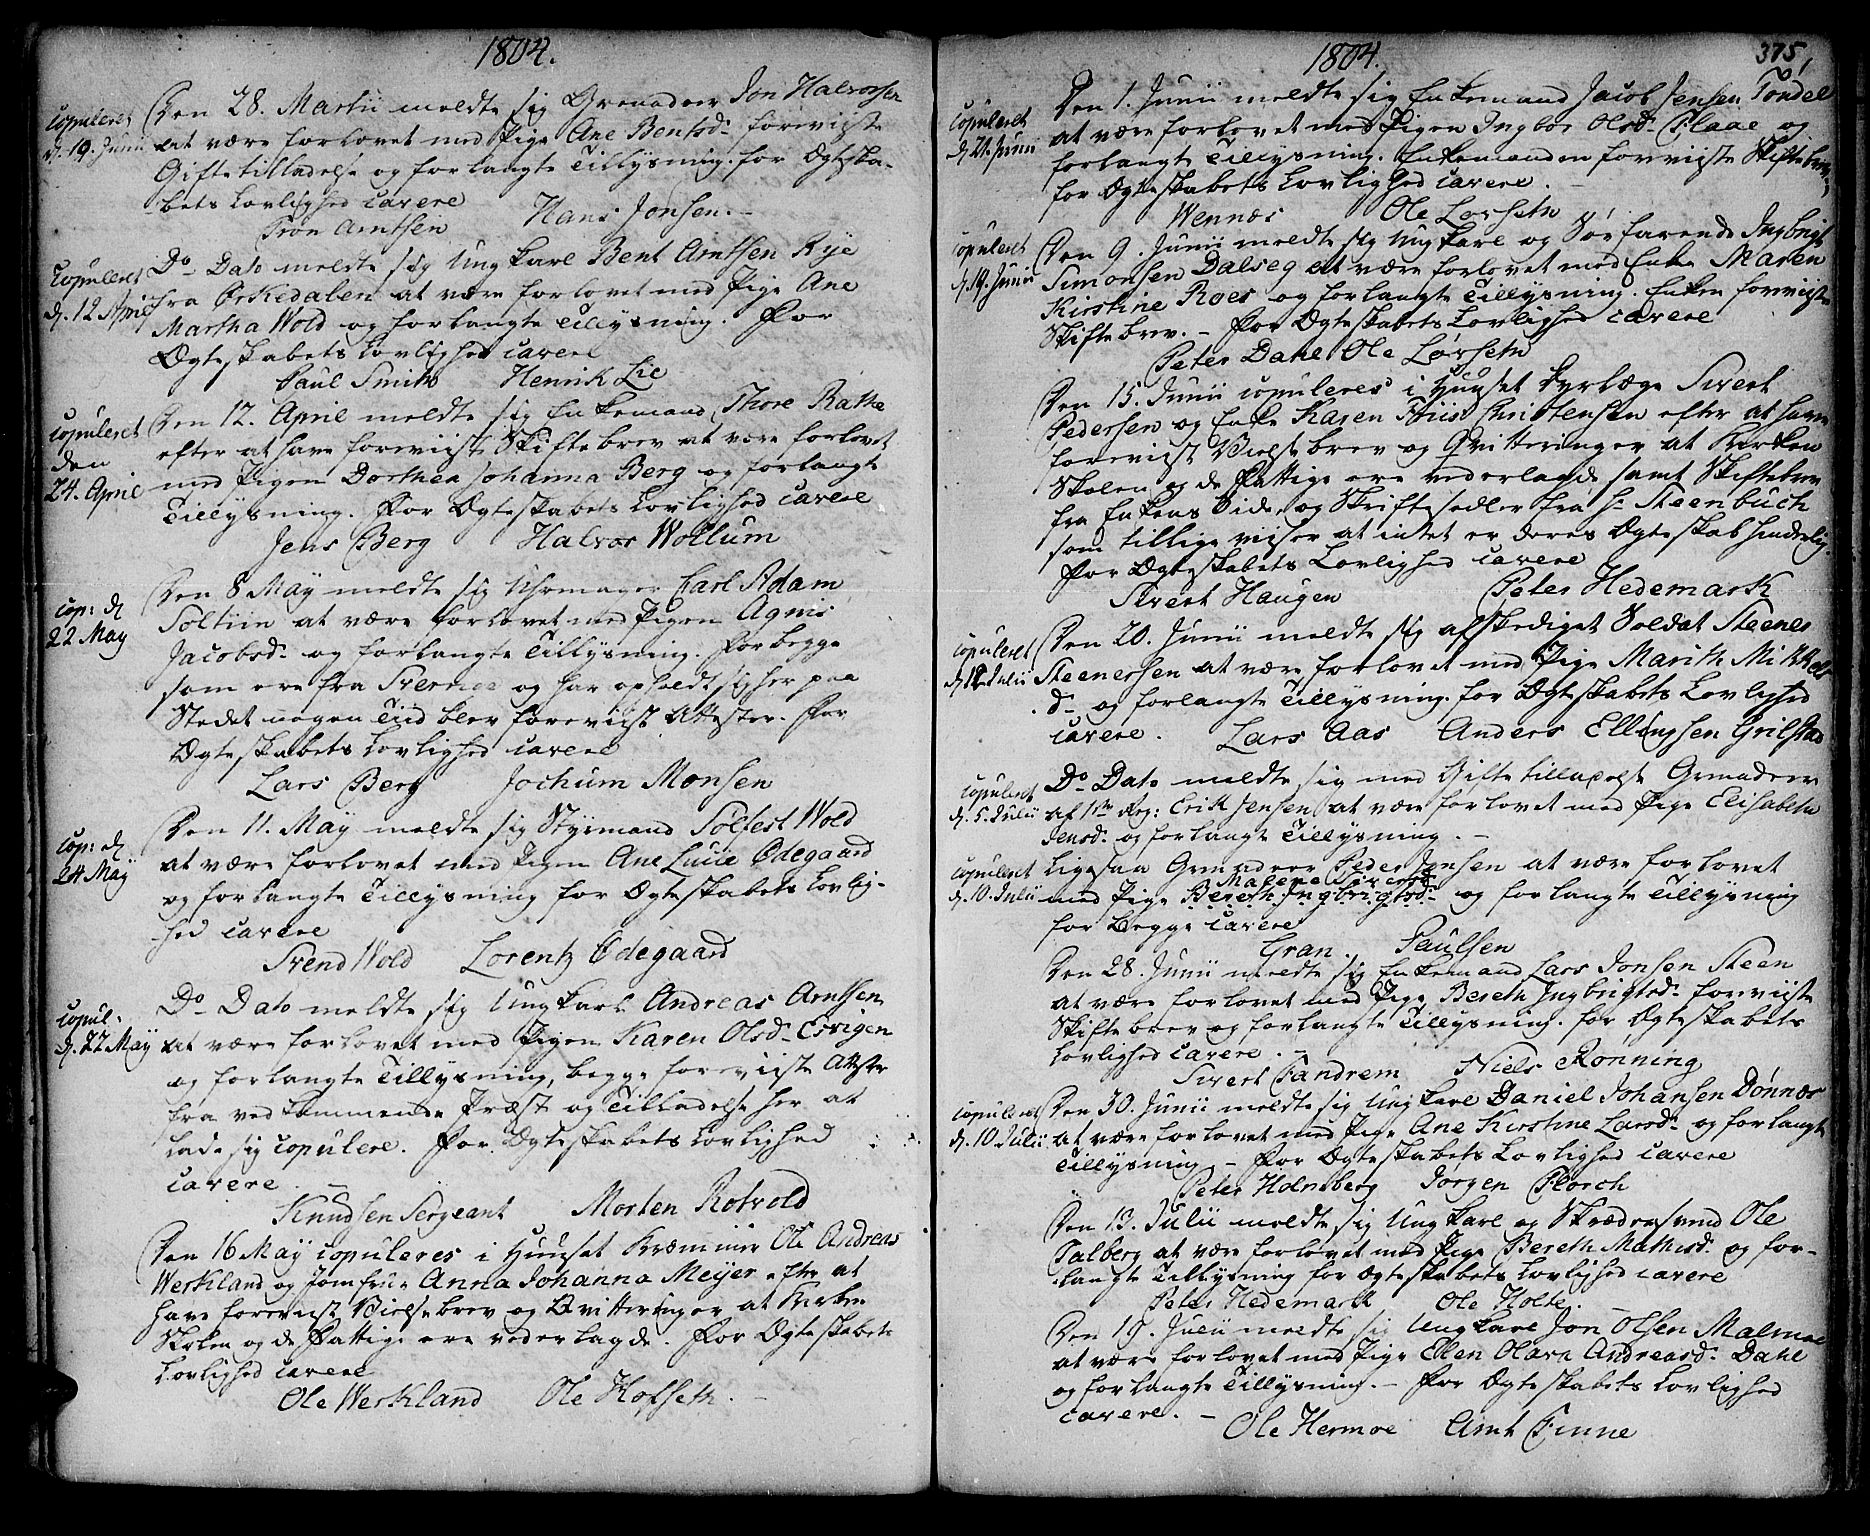 SAT, Ministerialprotokoller, klokkerbøker og fødselsregistre - Sør-Trøndelag, 601/L0038: Parish register (official) no. 601A06, 1766-1877, p. 375